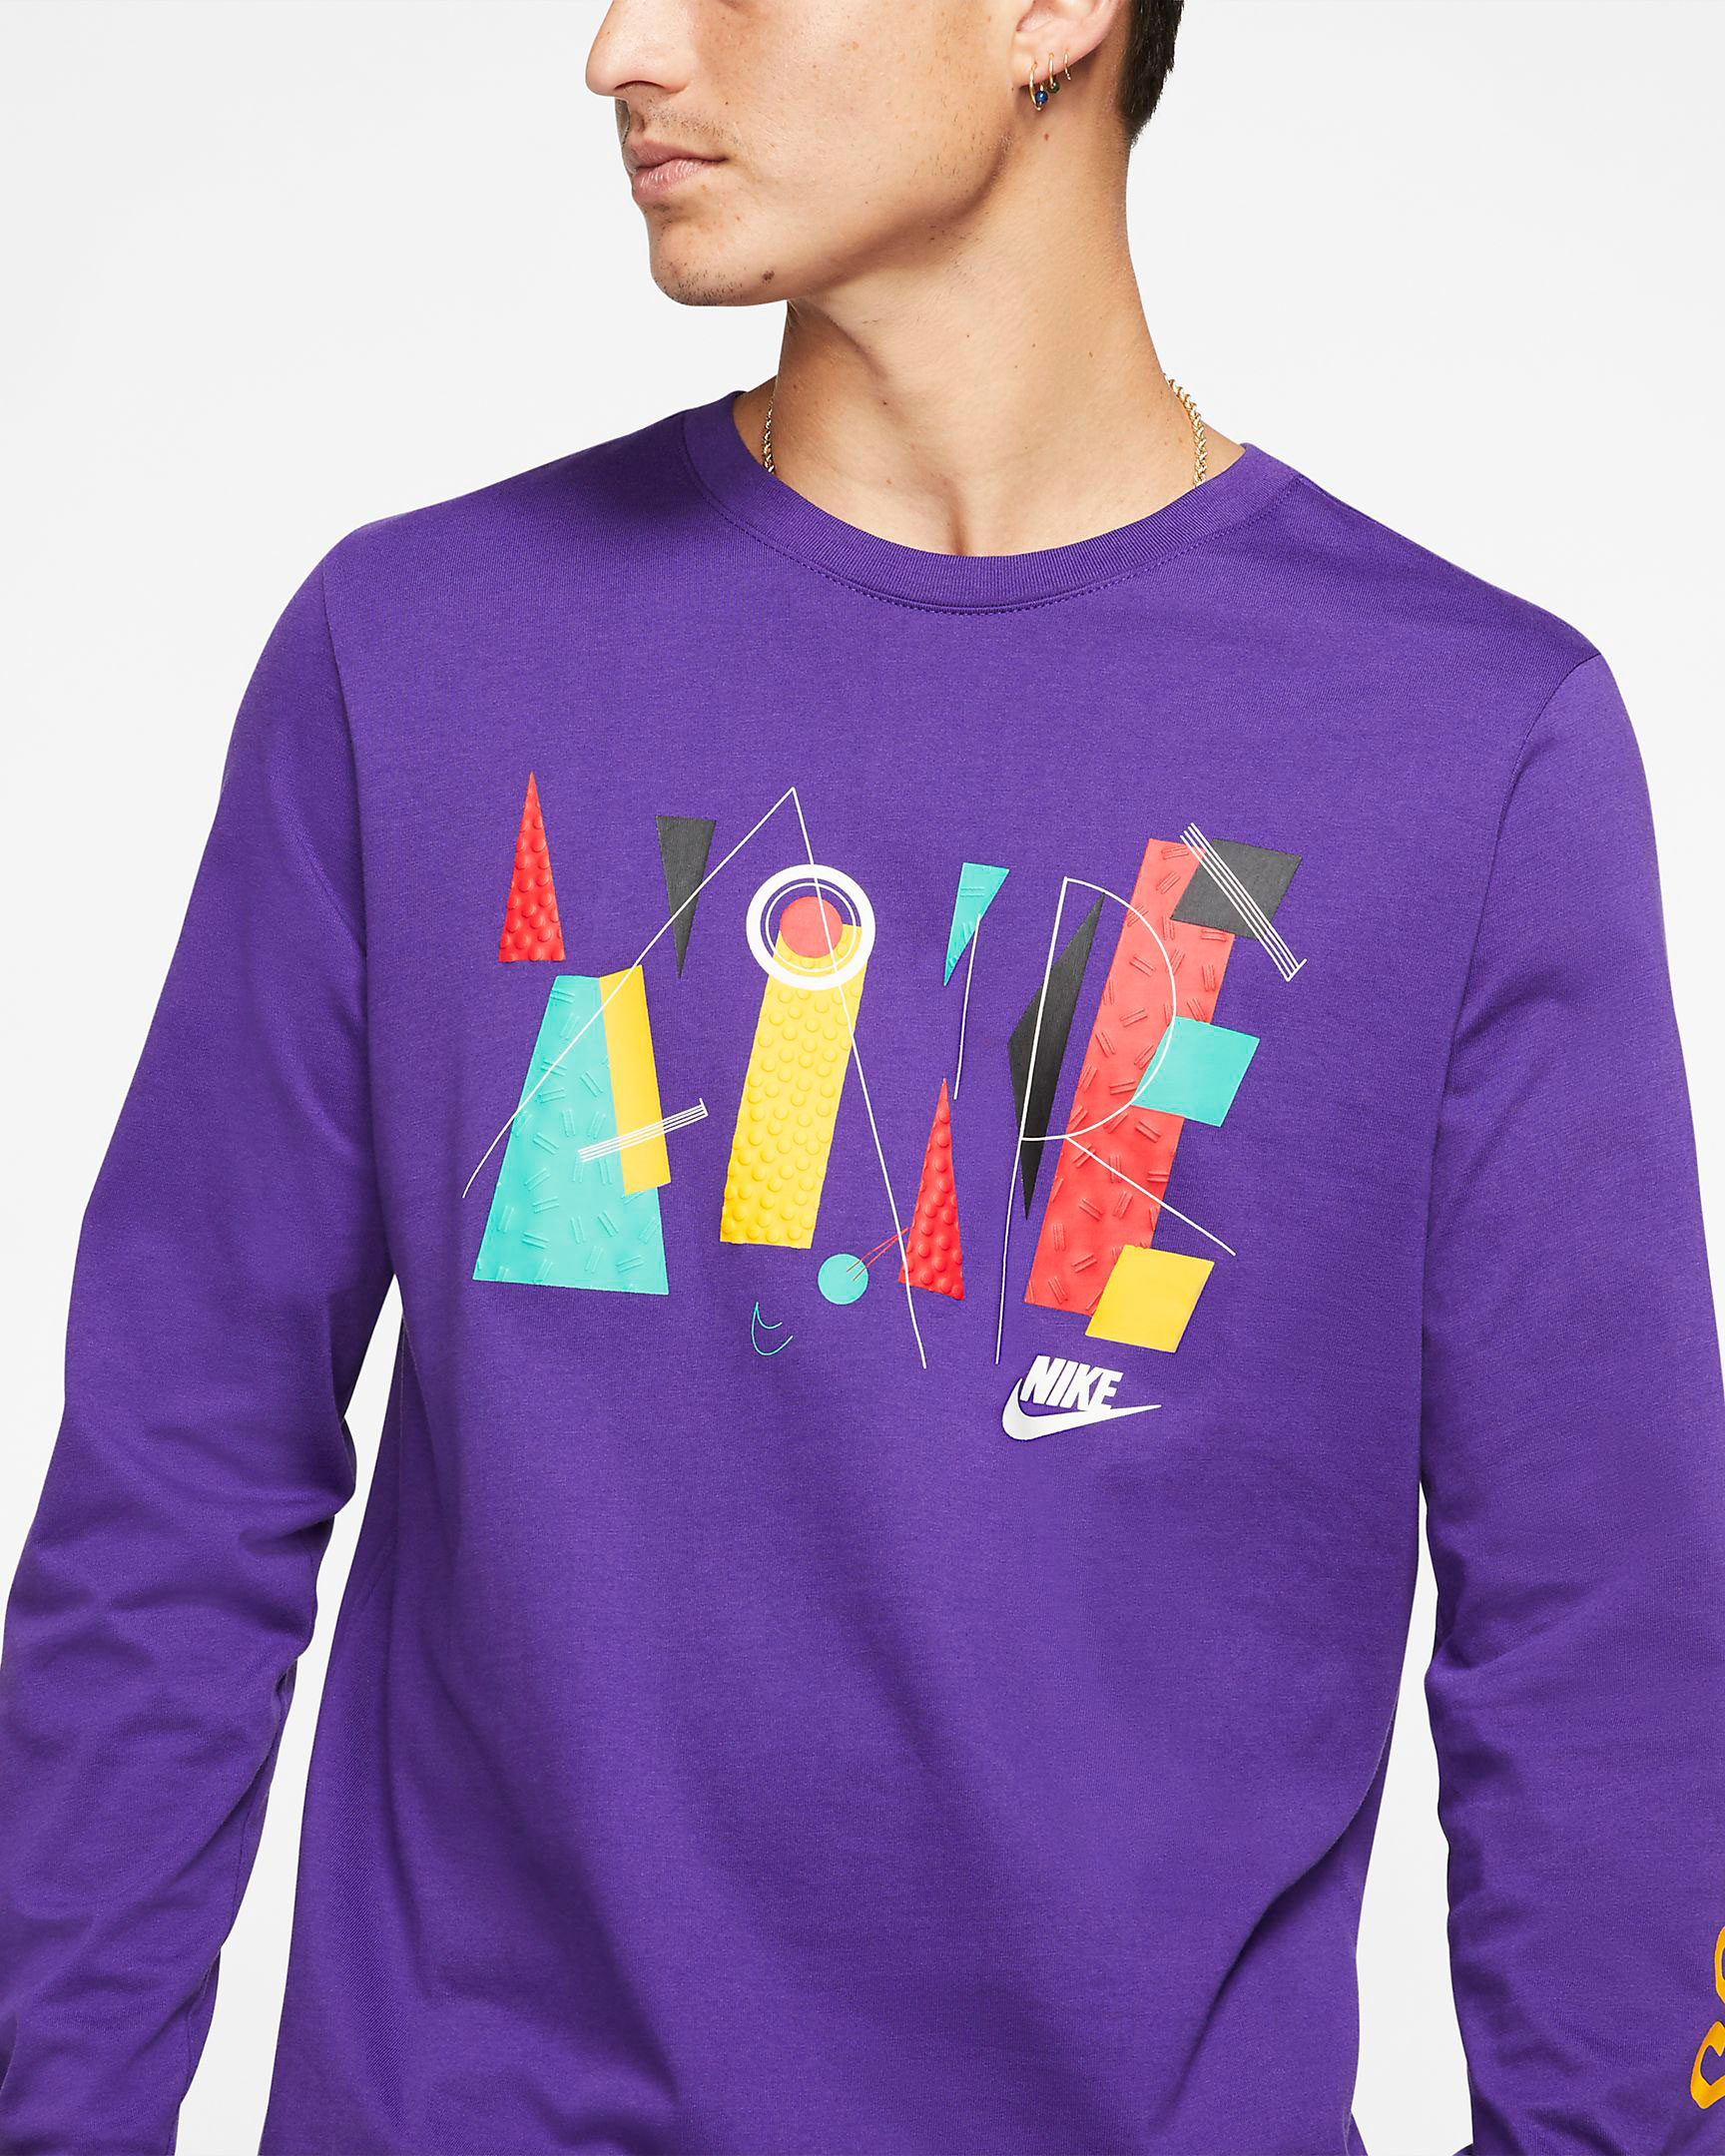 nike-foamposite-pro-purple-camo-shirt-match-2